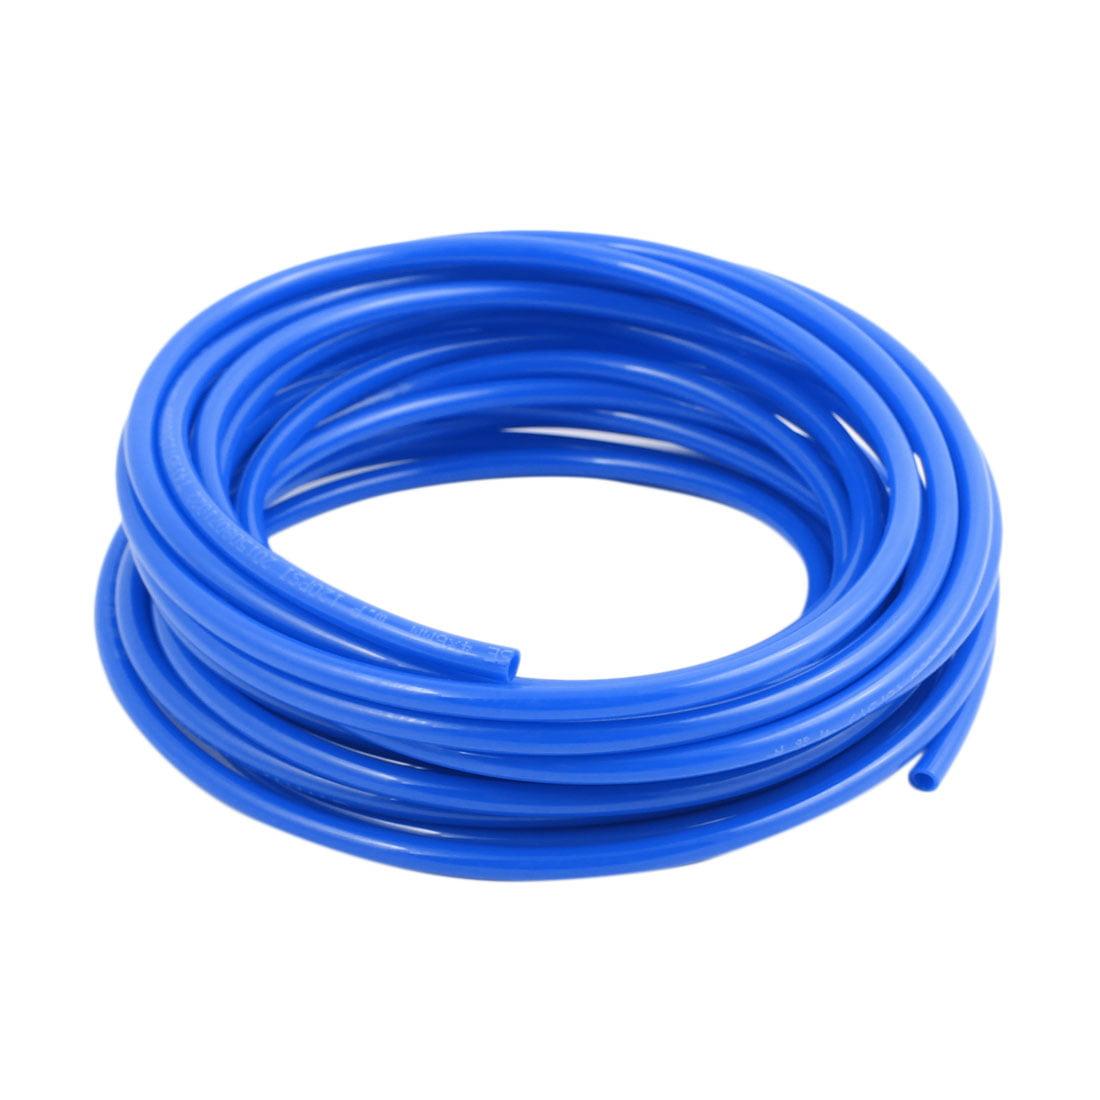 6mm x 4mm Pneumatic Air Compressor Tubing PU Hose Tube Pipe 8.5 meter Blue  sc 1 st  Walmart Canada & 6mm x 4mm Pneumatic Air Compressor Tubing PU Hose Tube Pipe 8.5 ...